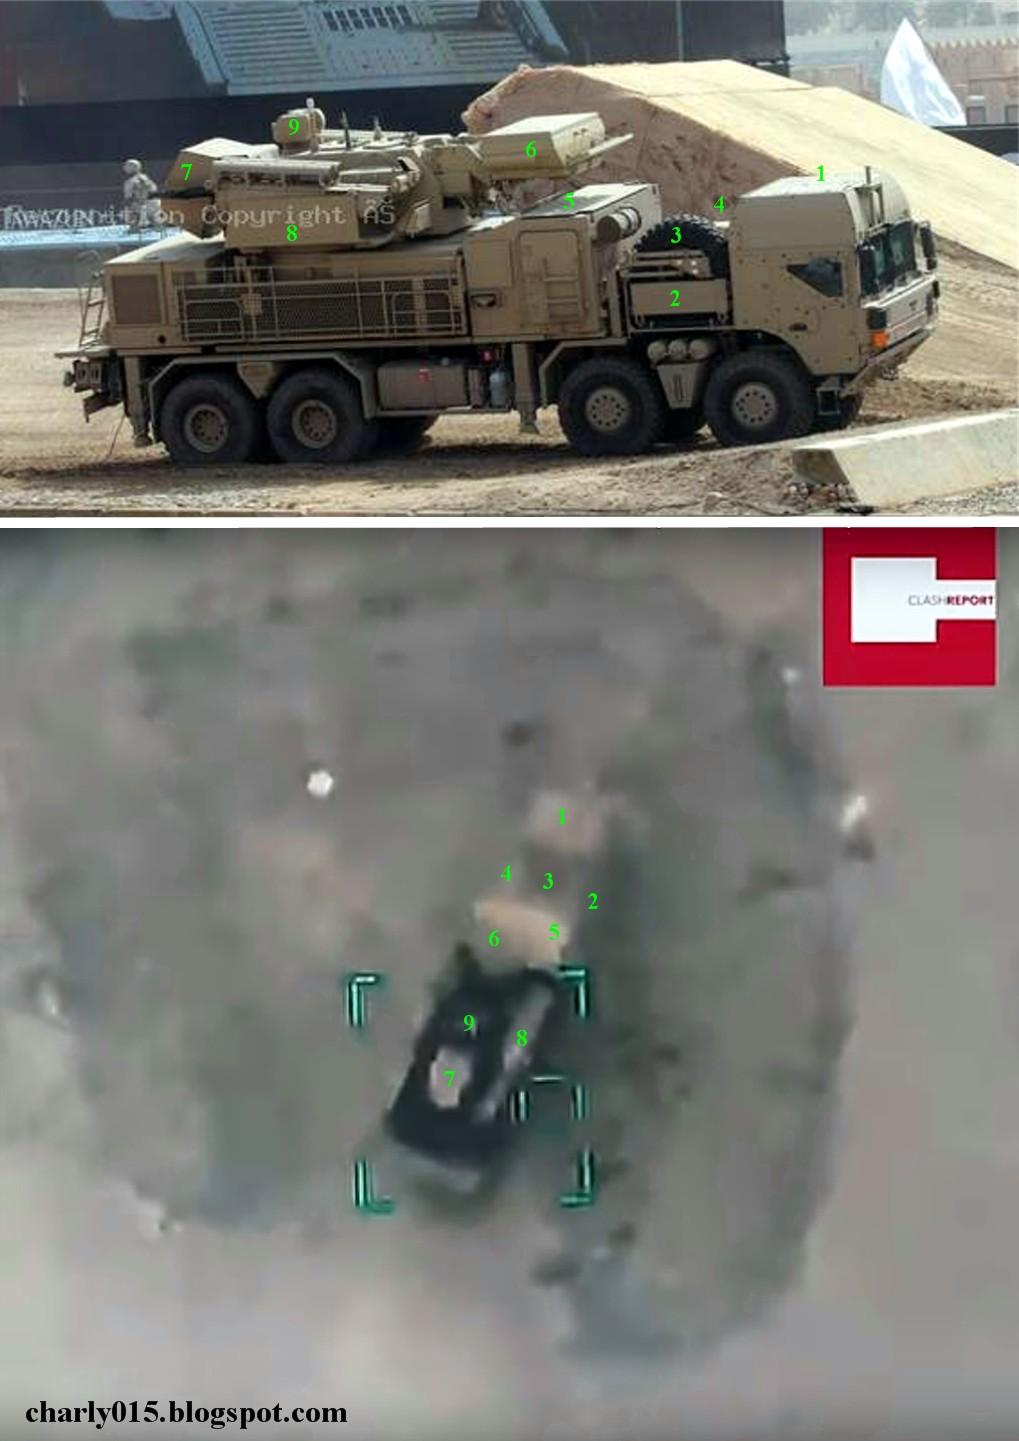 siria+pantsir+destrucci%25C3%25B3n+turqu